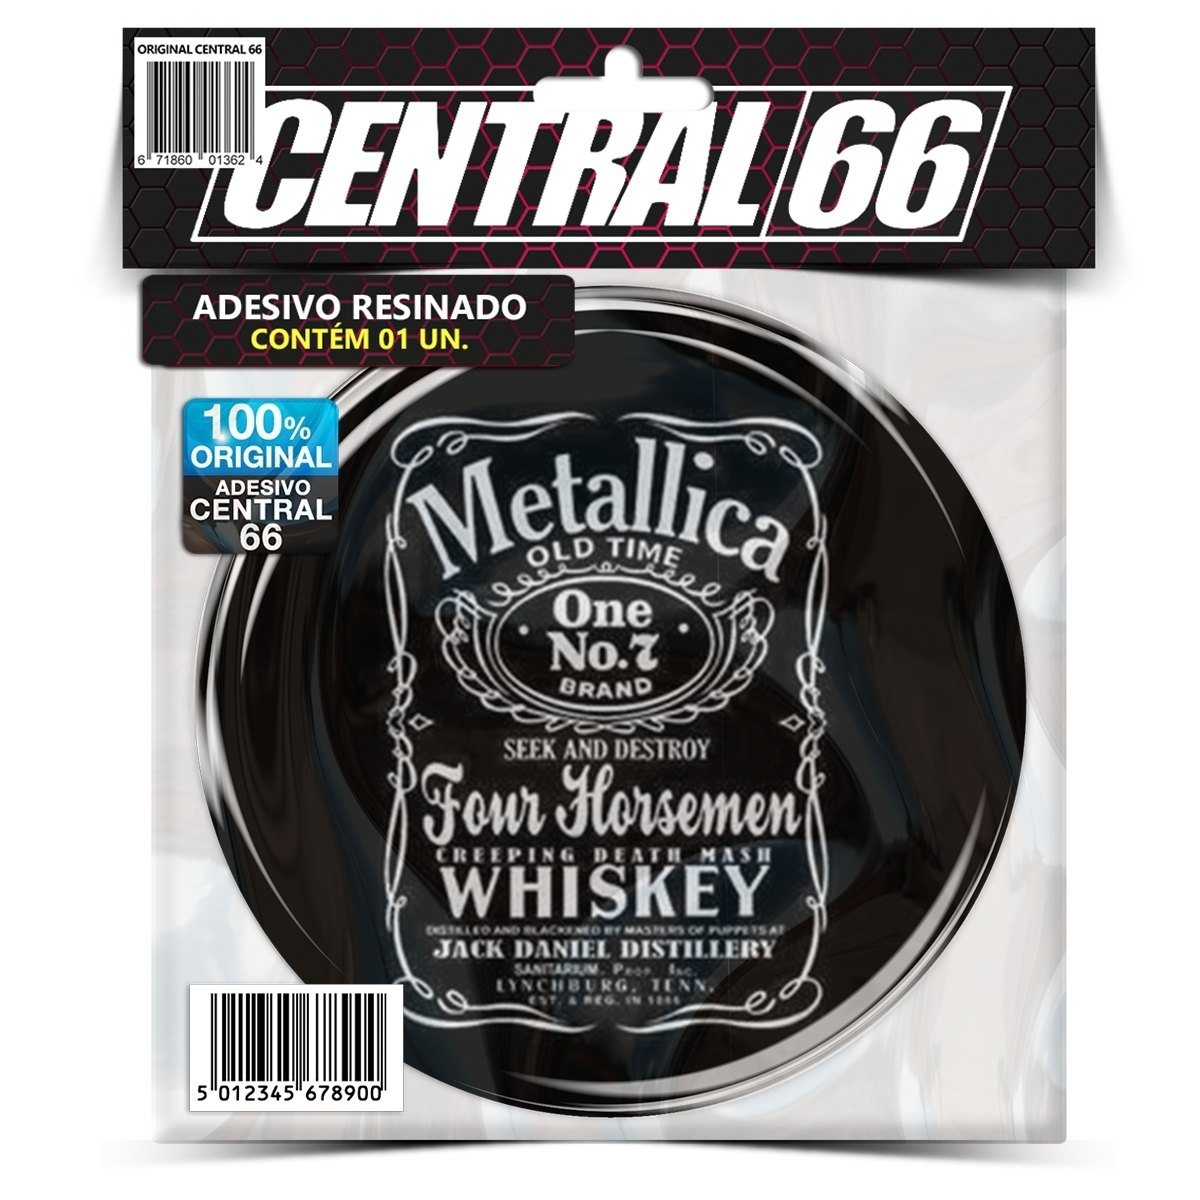 Adesivo Redondo Metallica Jack Daniels – Central 66